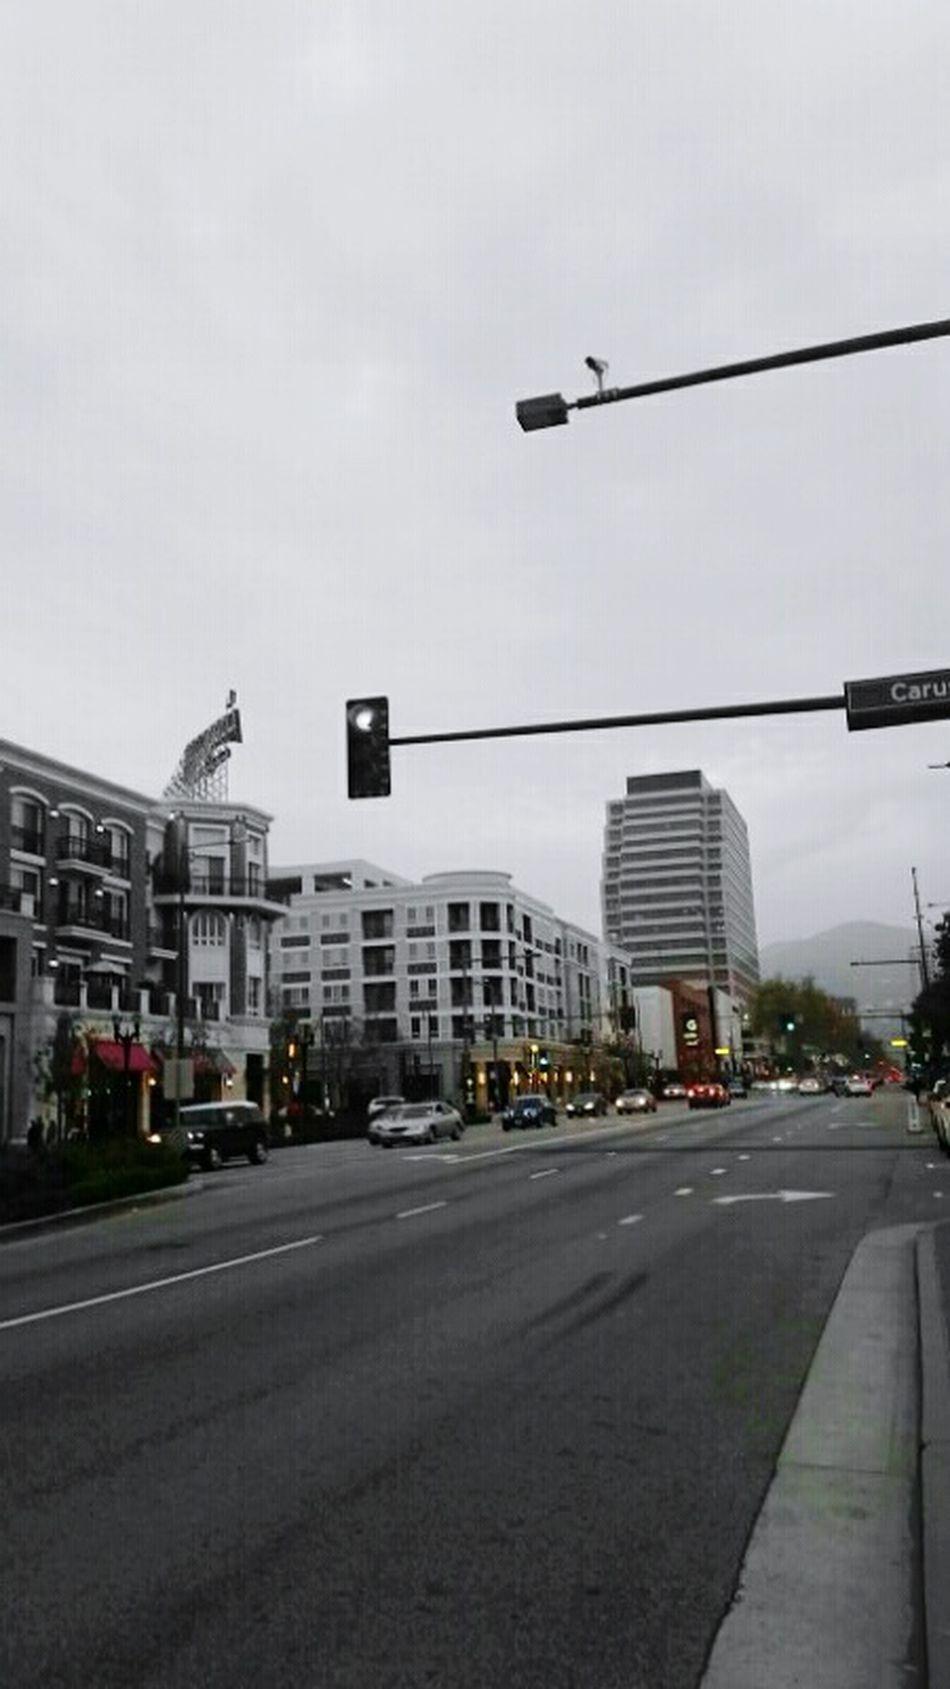 City City Street Outdoors Day Urban Road No People Sky Los Angeles, California Panamericana Panamerican Road